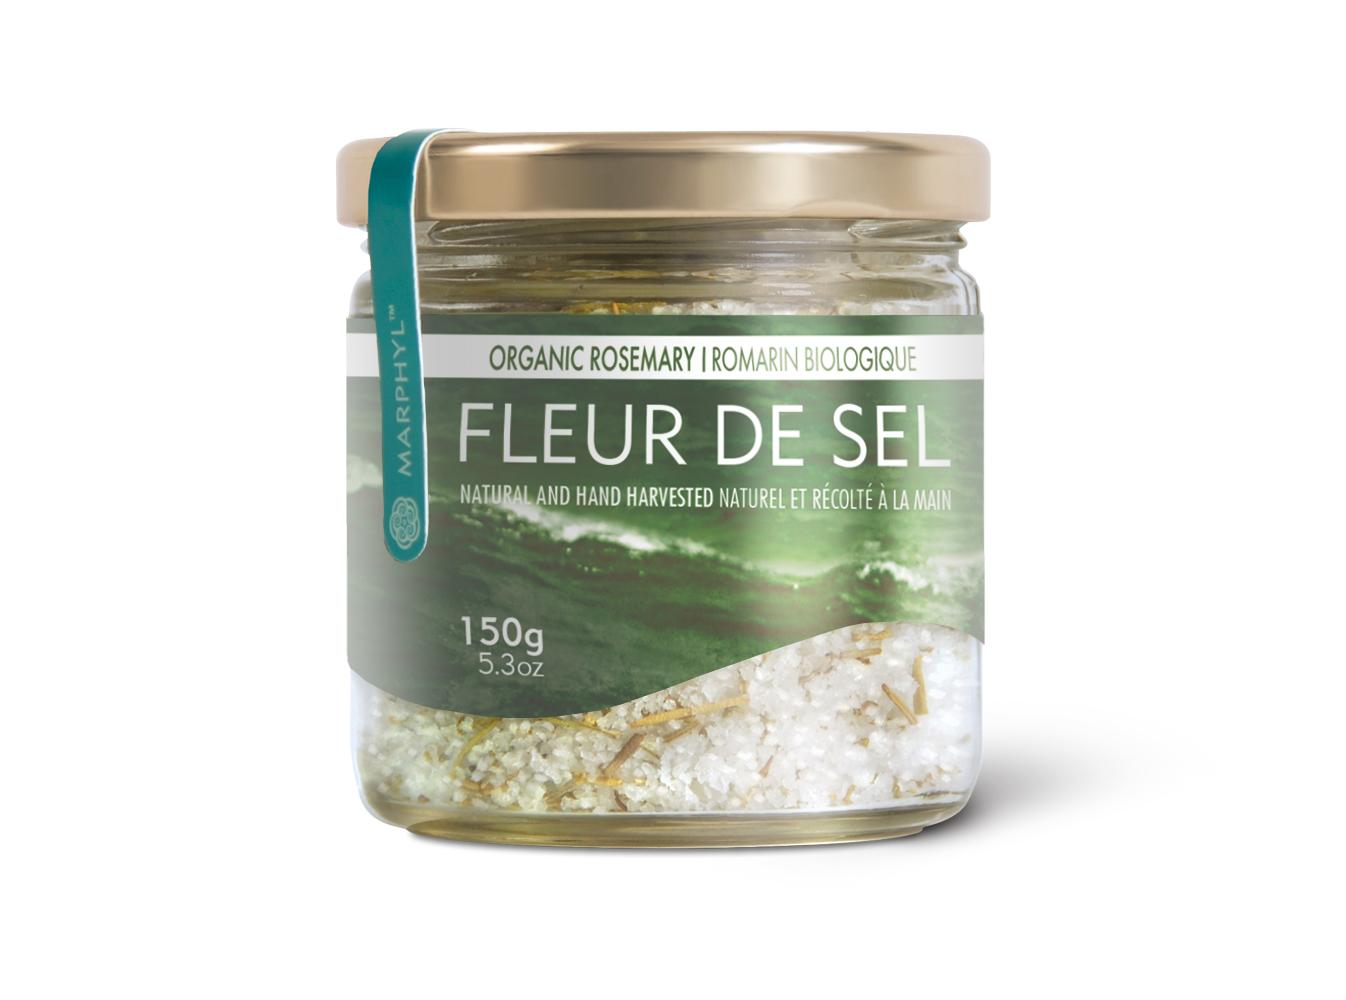 Marphyl Marine Phytoplankton Natural Sea Salt 150g 5.3oz Organic Rosemary